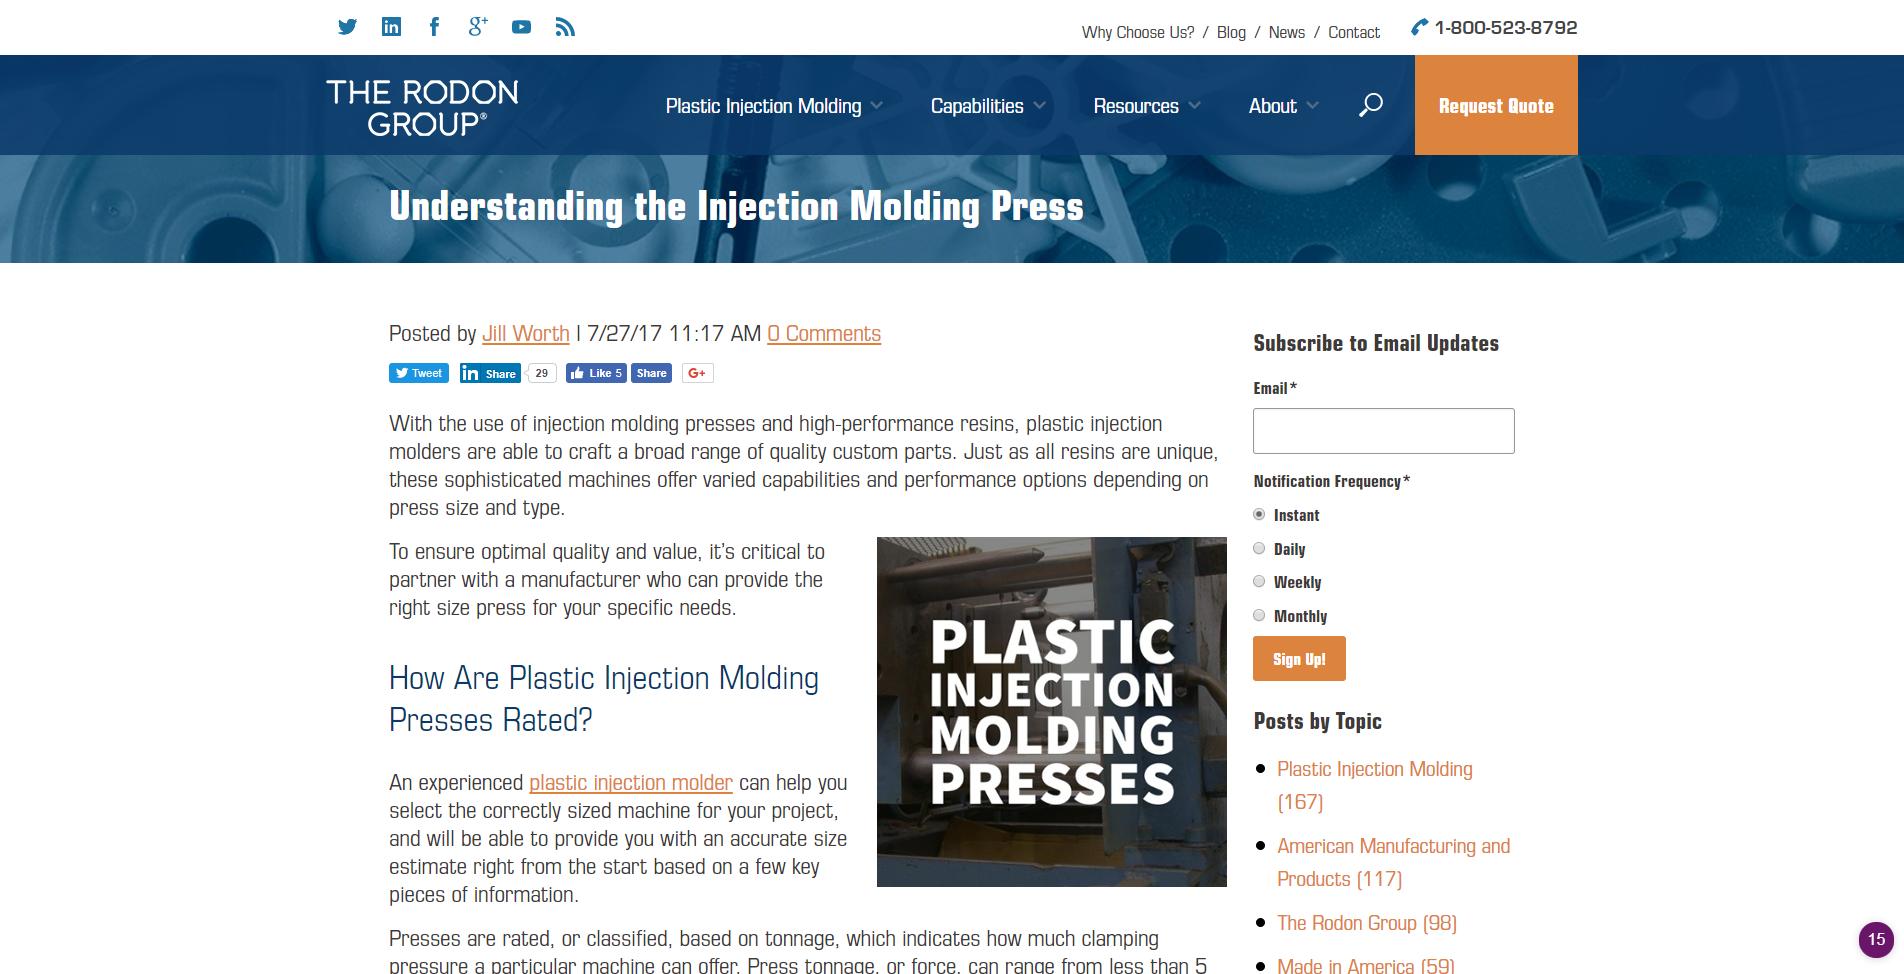 rodon-group-blog.png